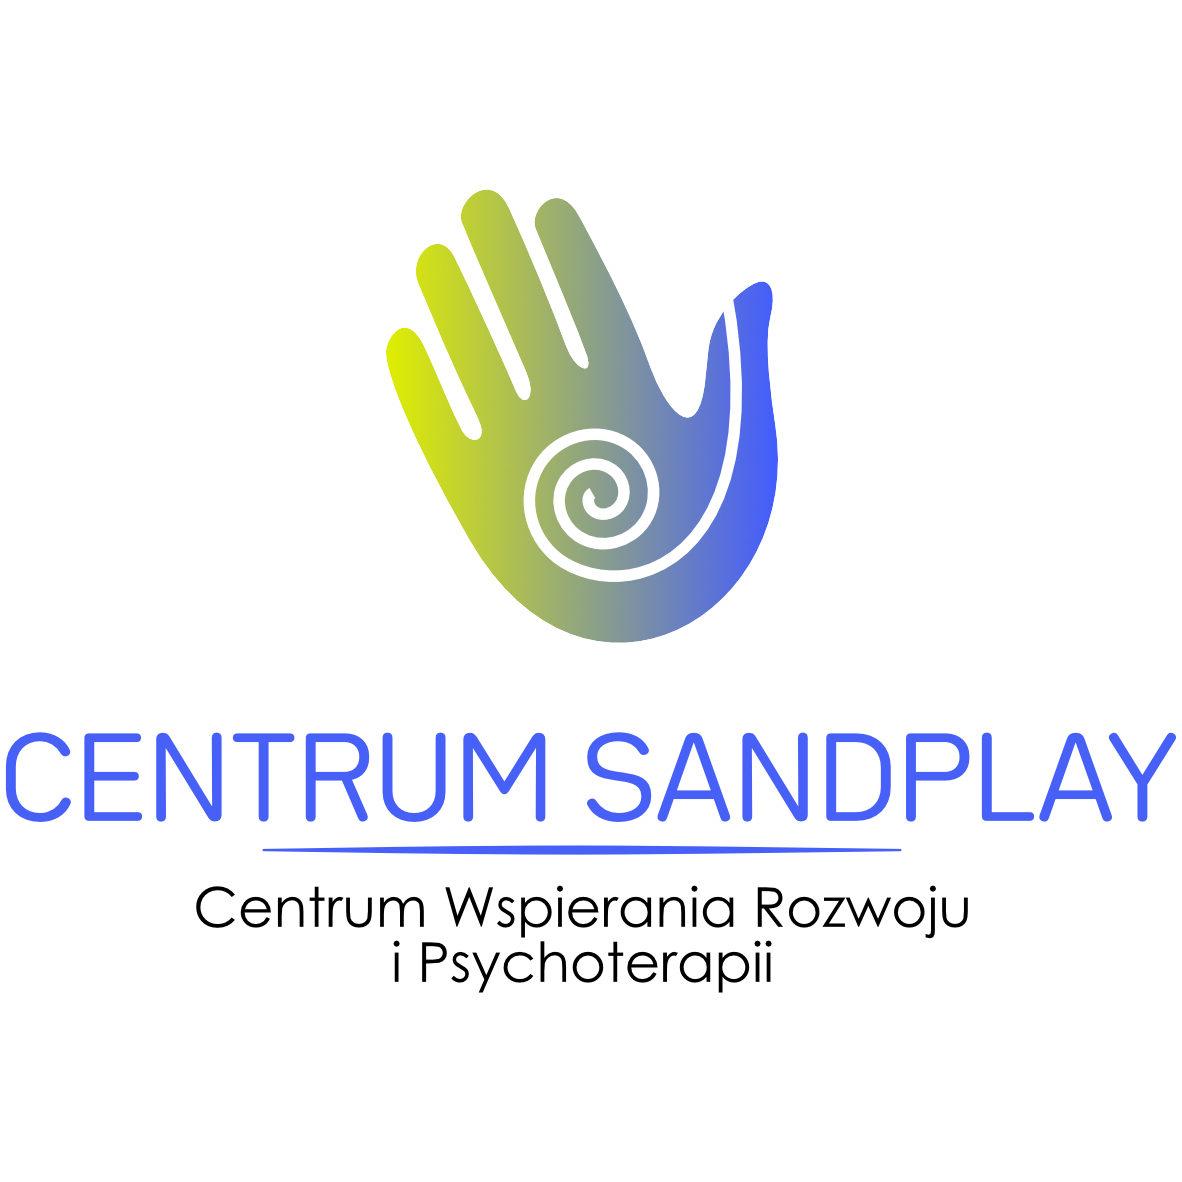 Centrum Sandplay